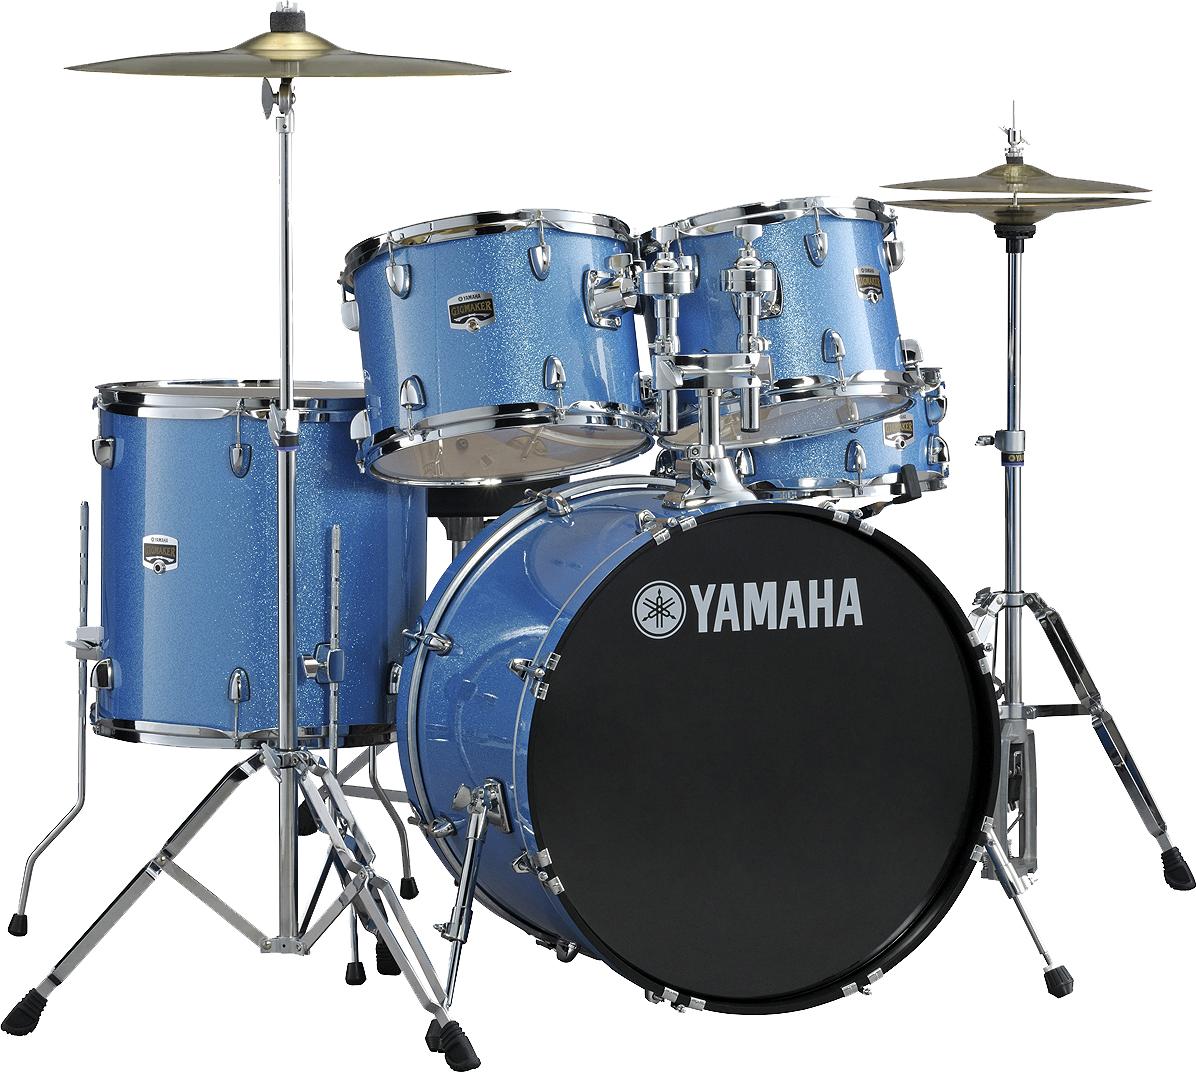 Yamaha Drums Kit PNG Image